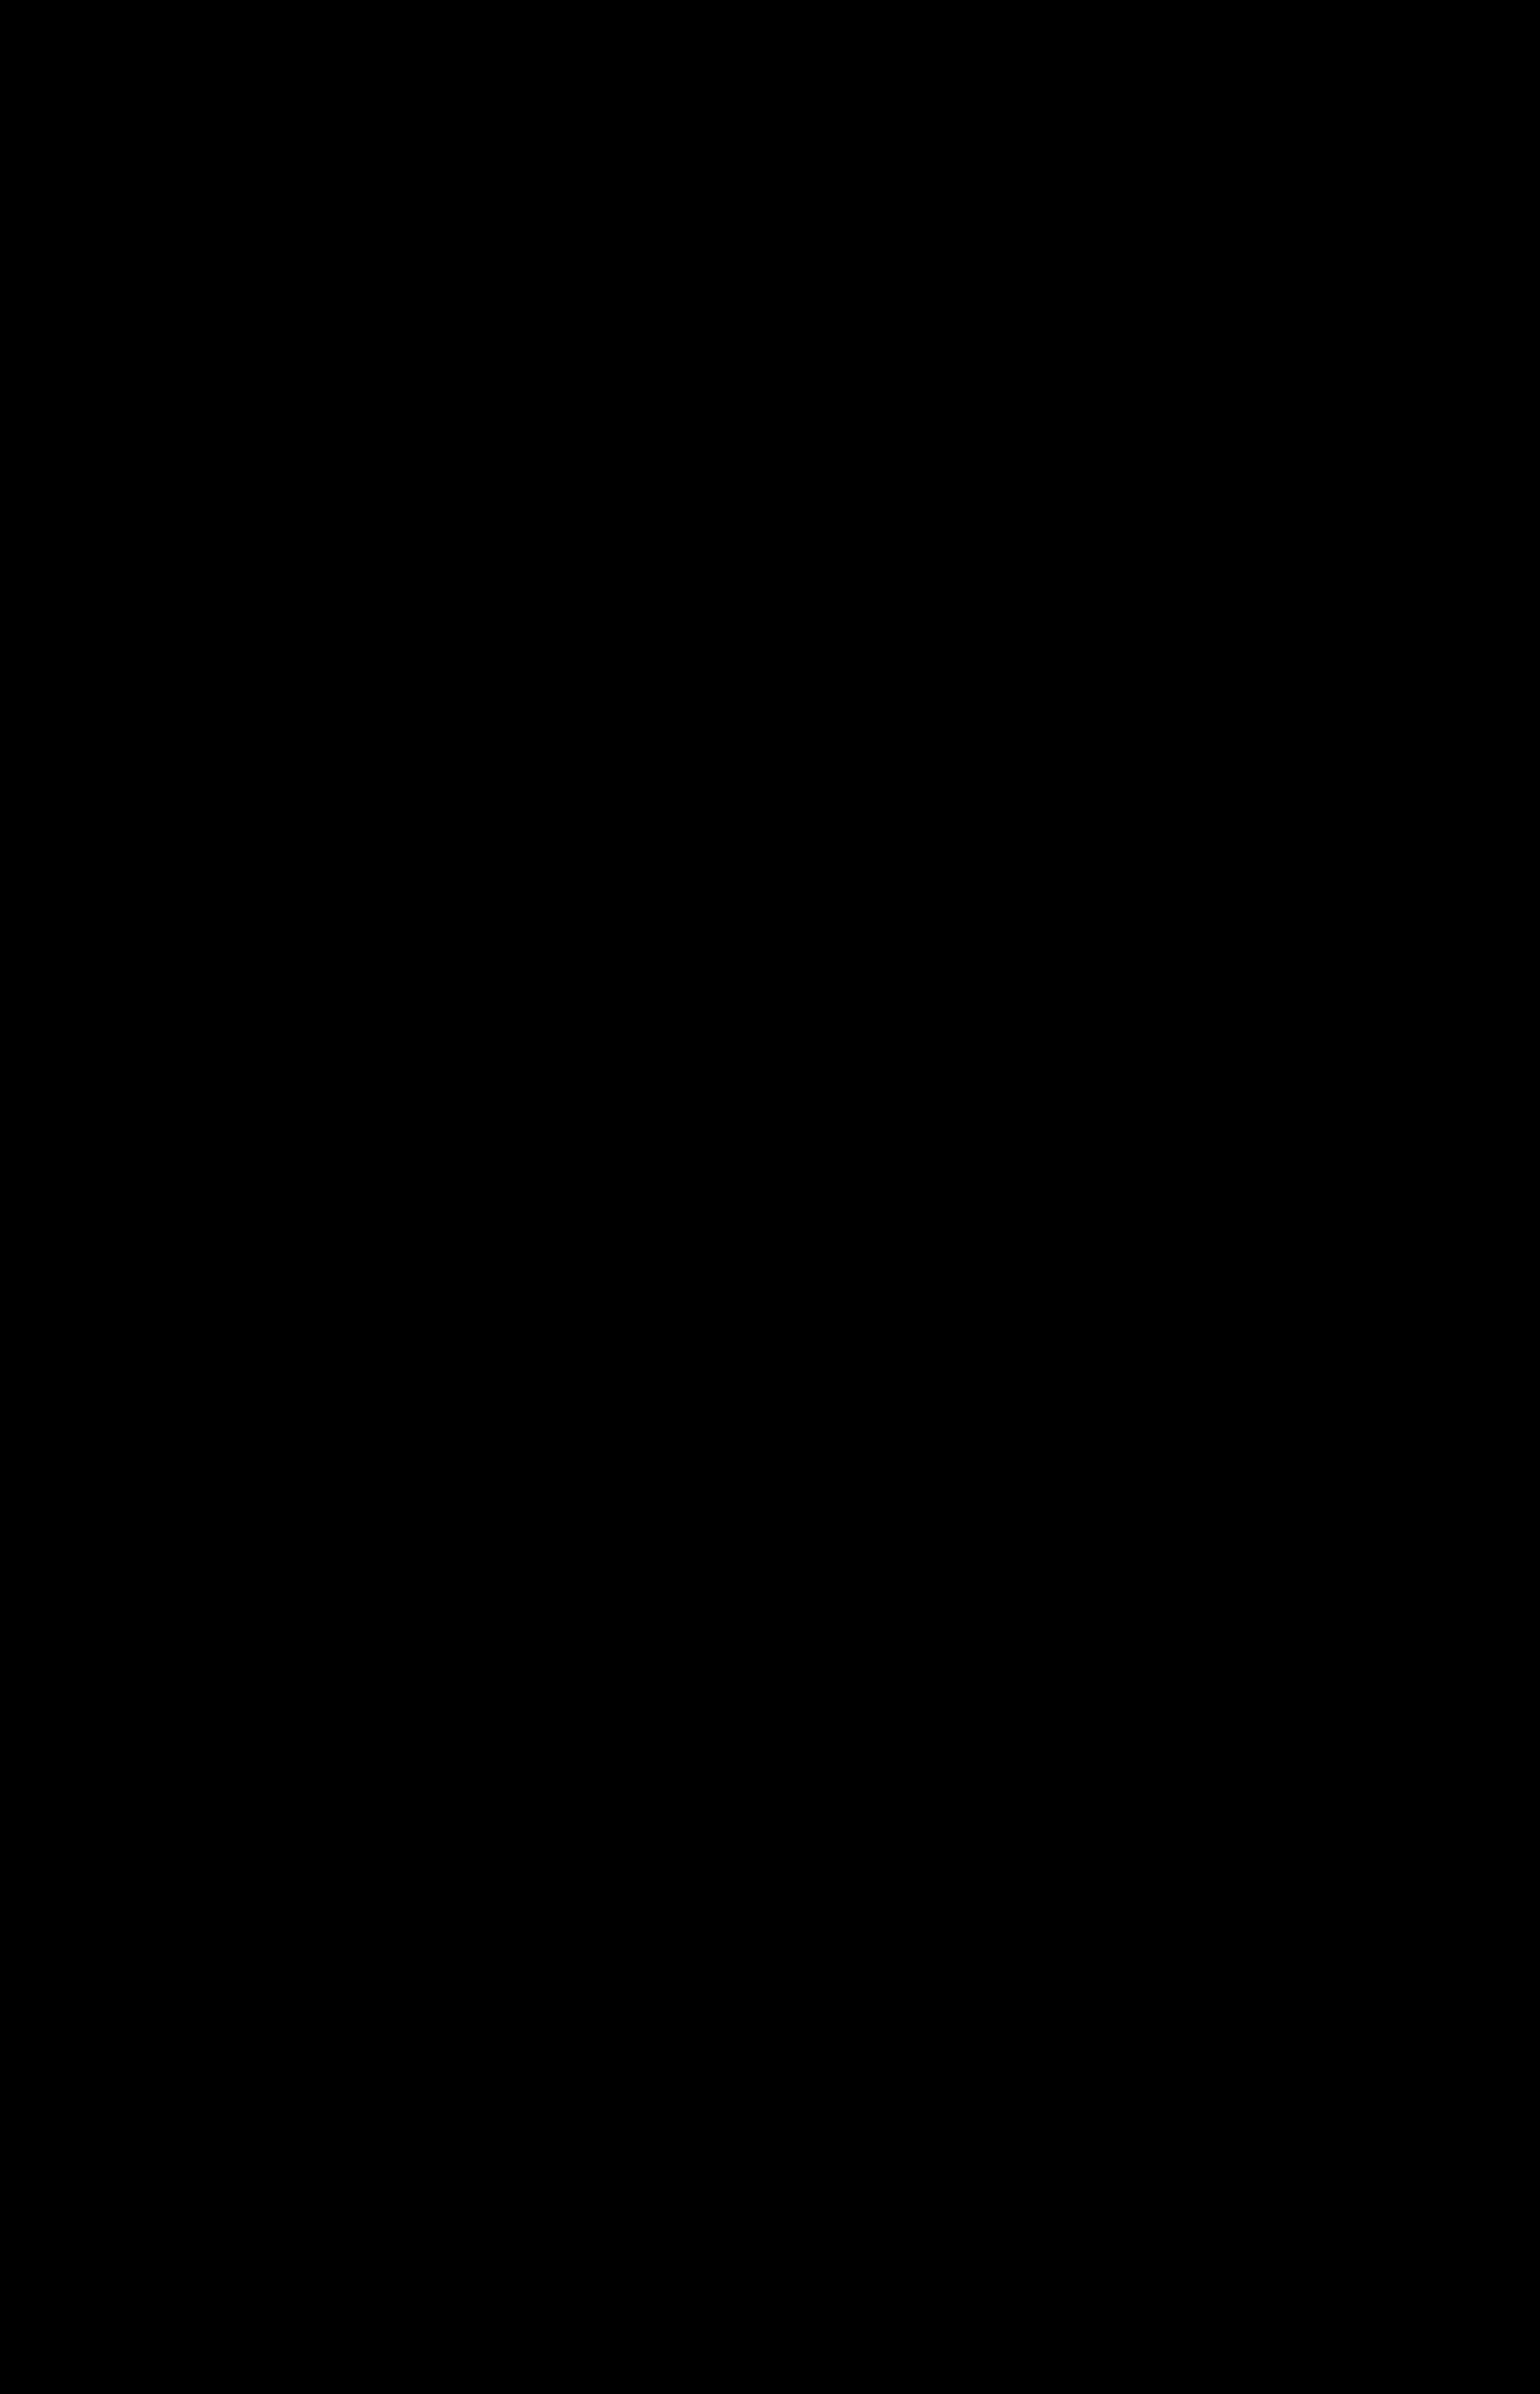 Solar Tracker Based Solar Panel Using 11 furthermore E6 96 B0 E9 AA 90 E8 BE BE E7 A9 BA E8 B0 83 E6 B8 85 E6 B4 97 further Modulacao Por Largura De Impulso  m Parte 1 as well Manual further Programmable Logic Controllers Plc. on motor circuit diagram